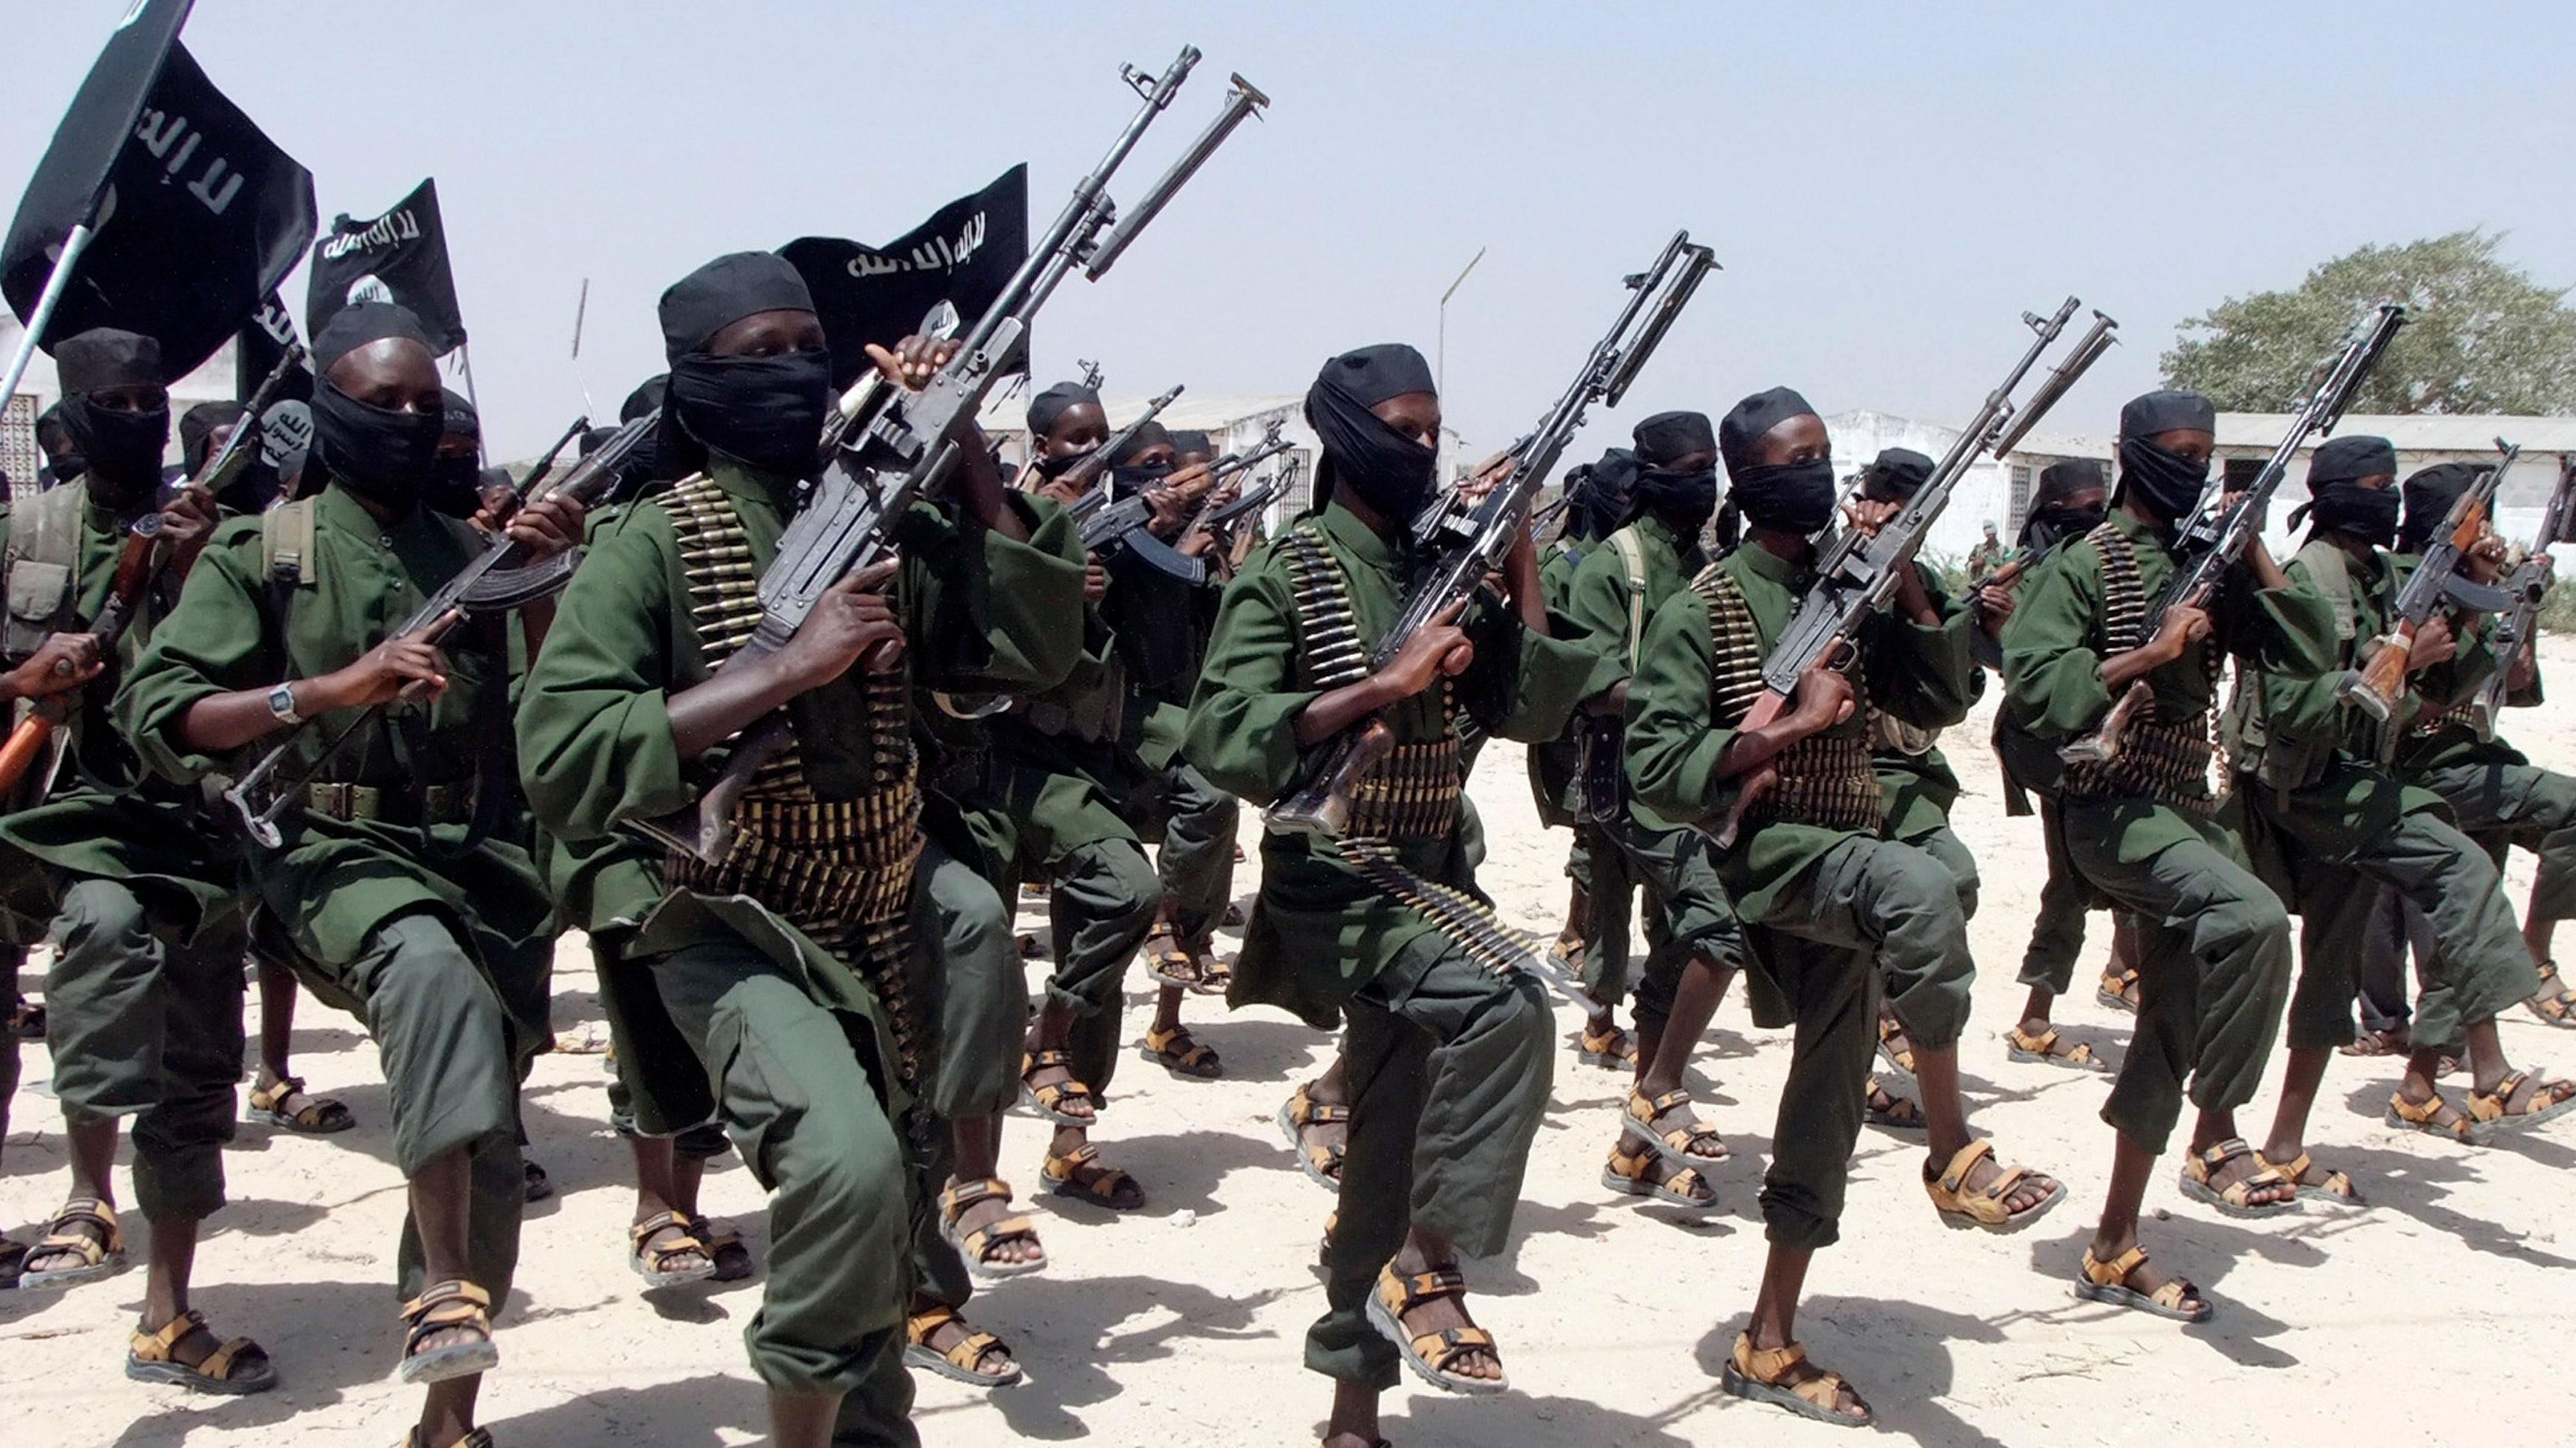 US airstrike targets al-Shabab militants, Pentagon says